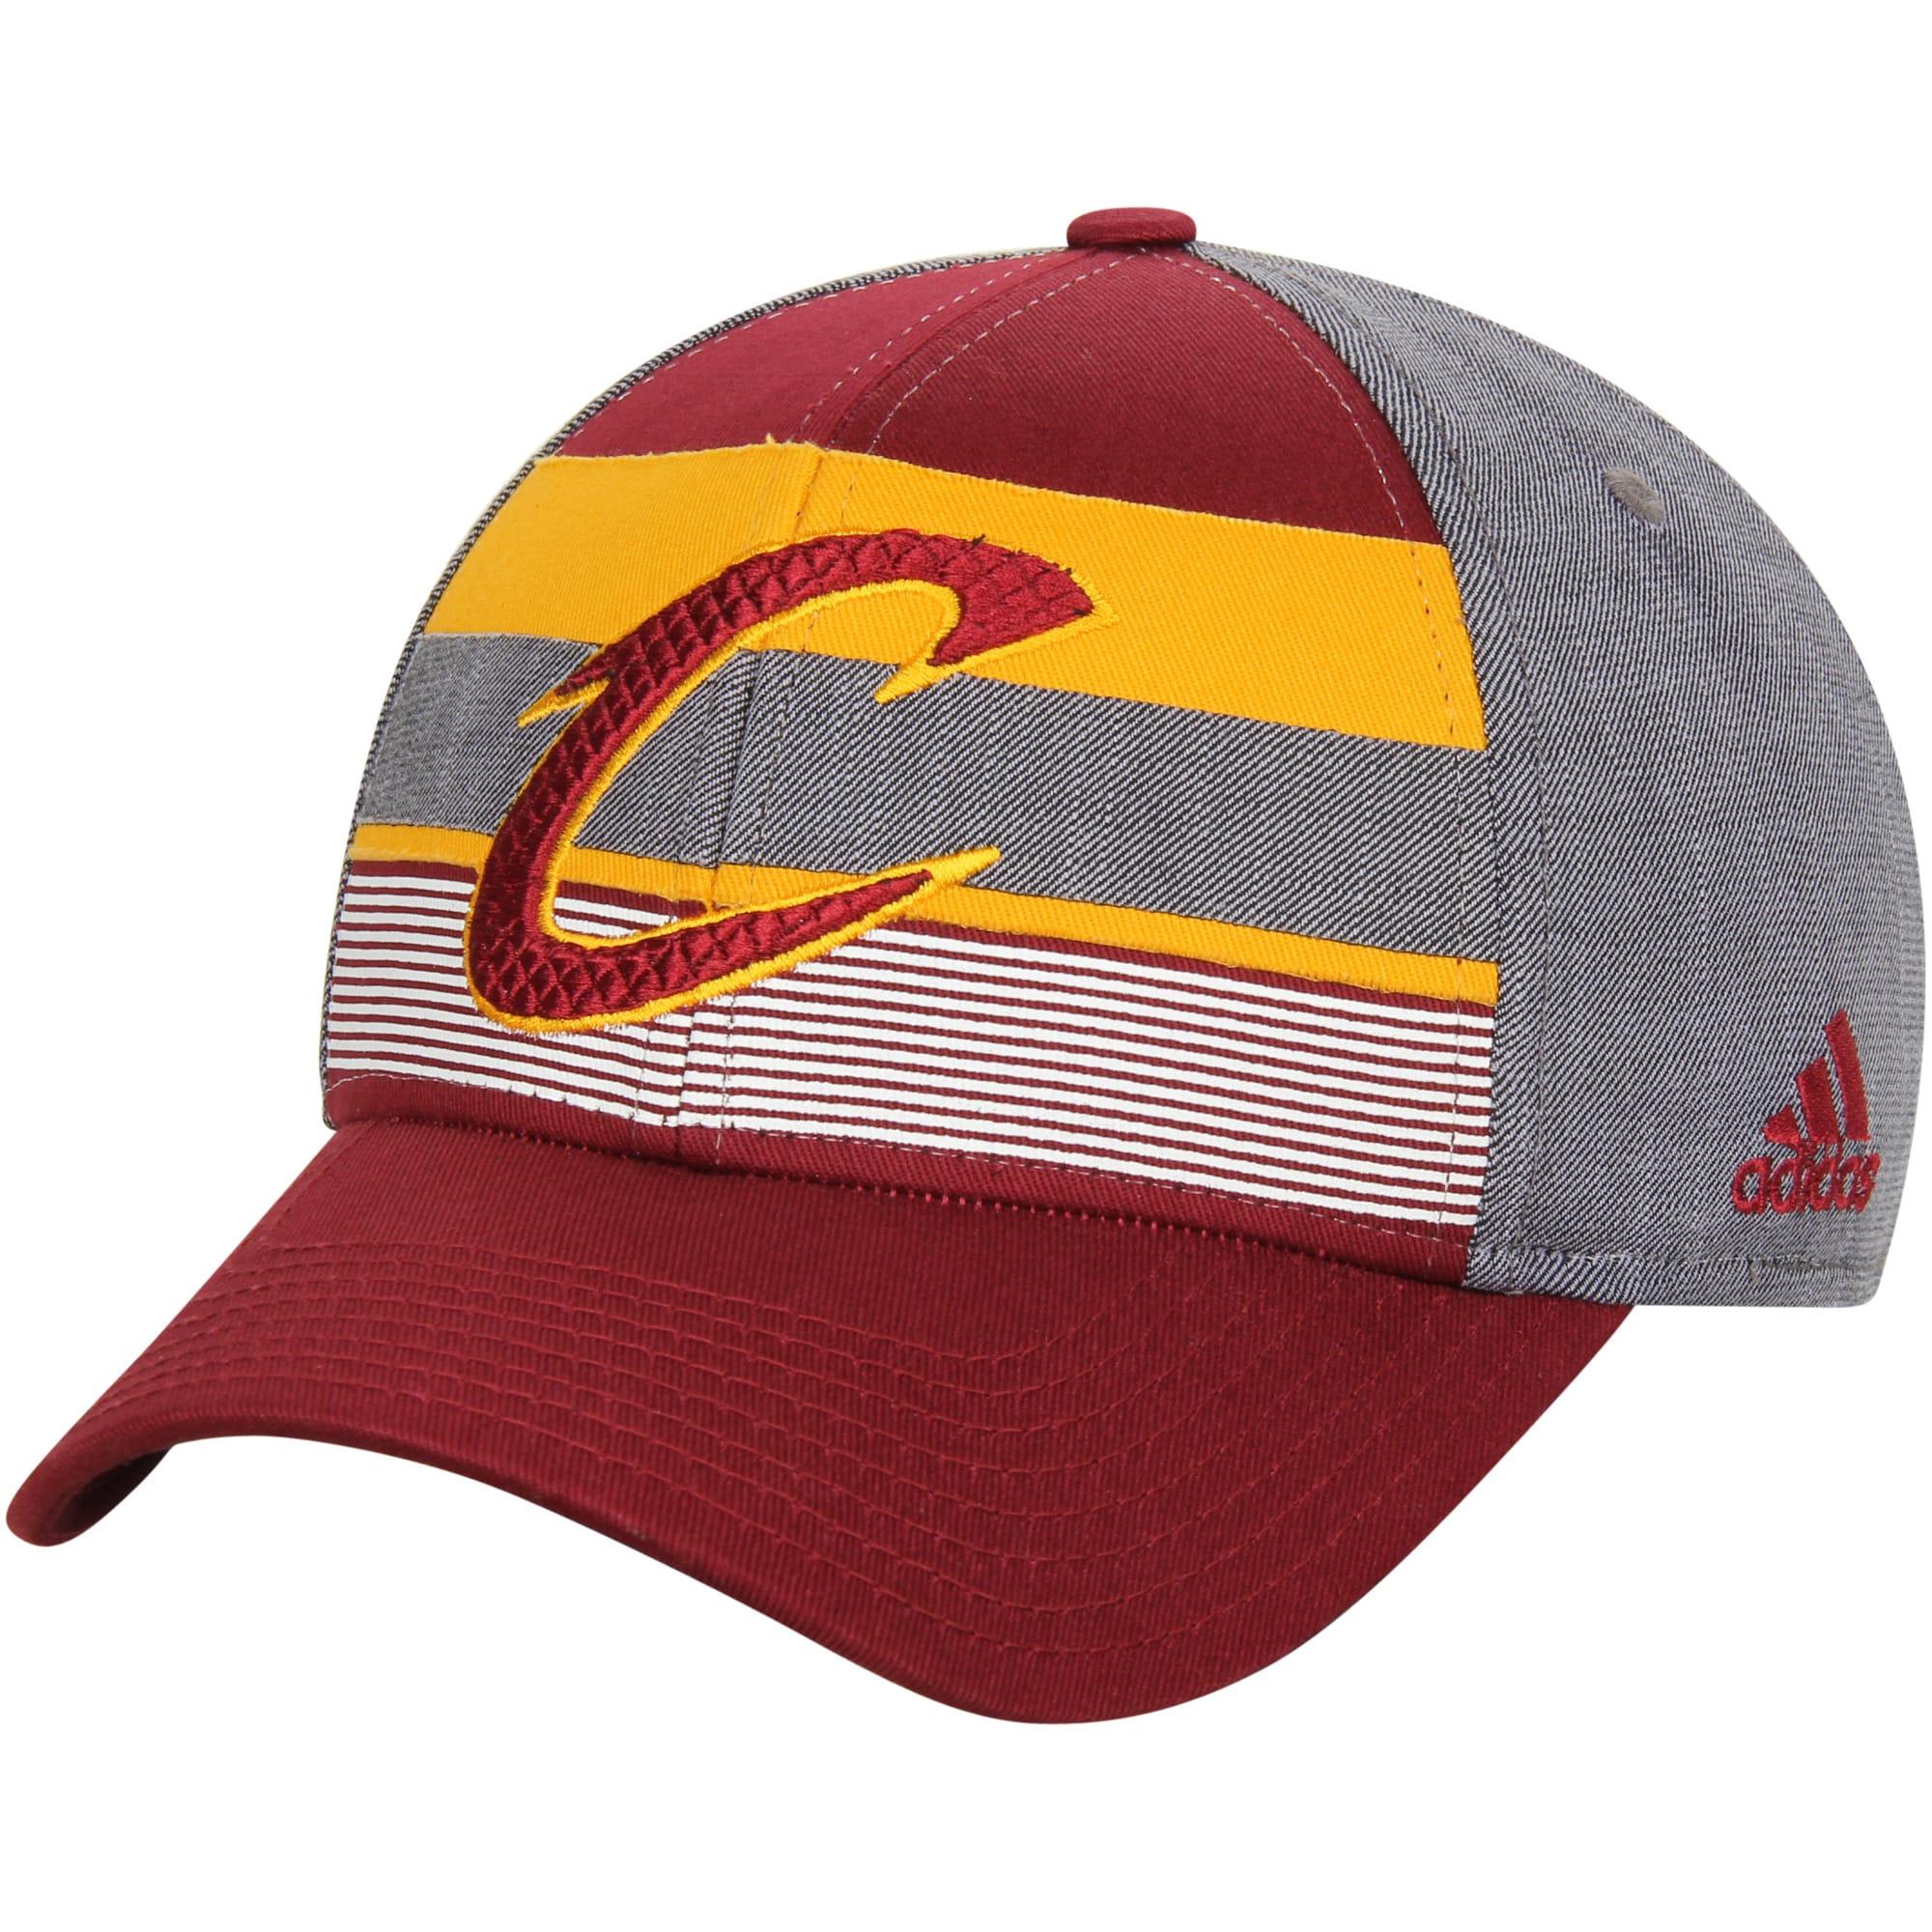 Cleveland Cavaliers adidas Team Logo Striped Flex Hat - Wine/Gray